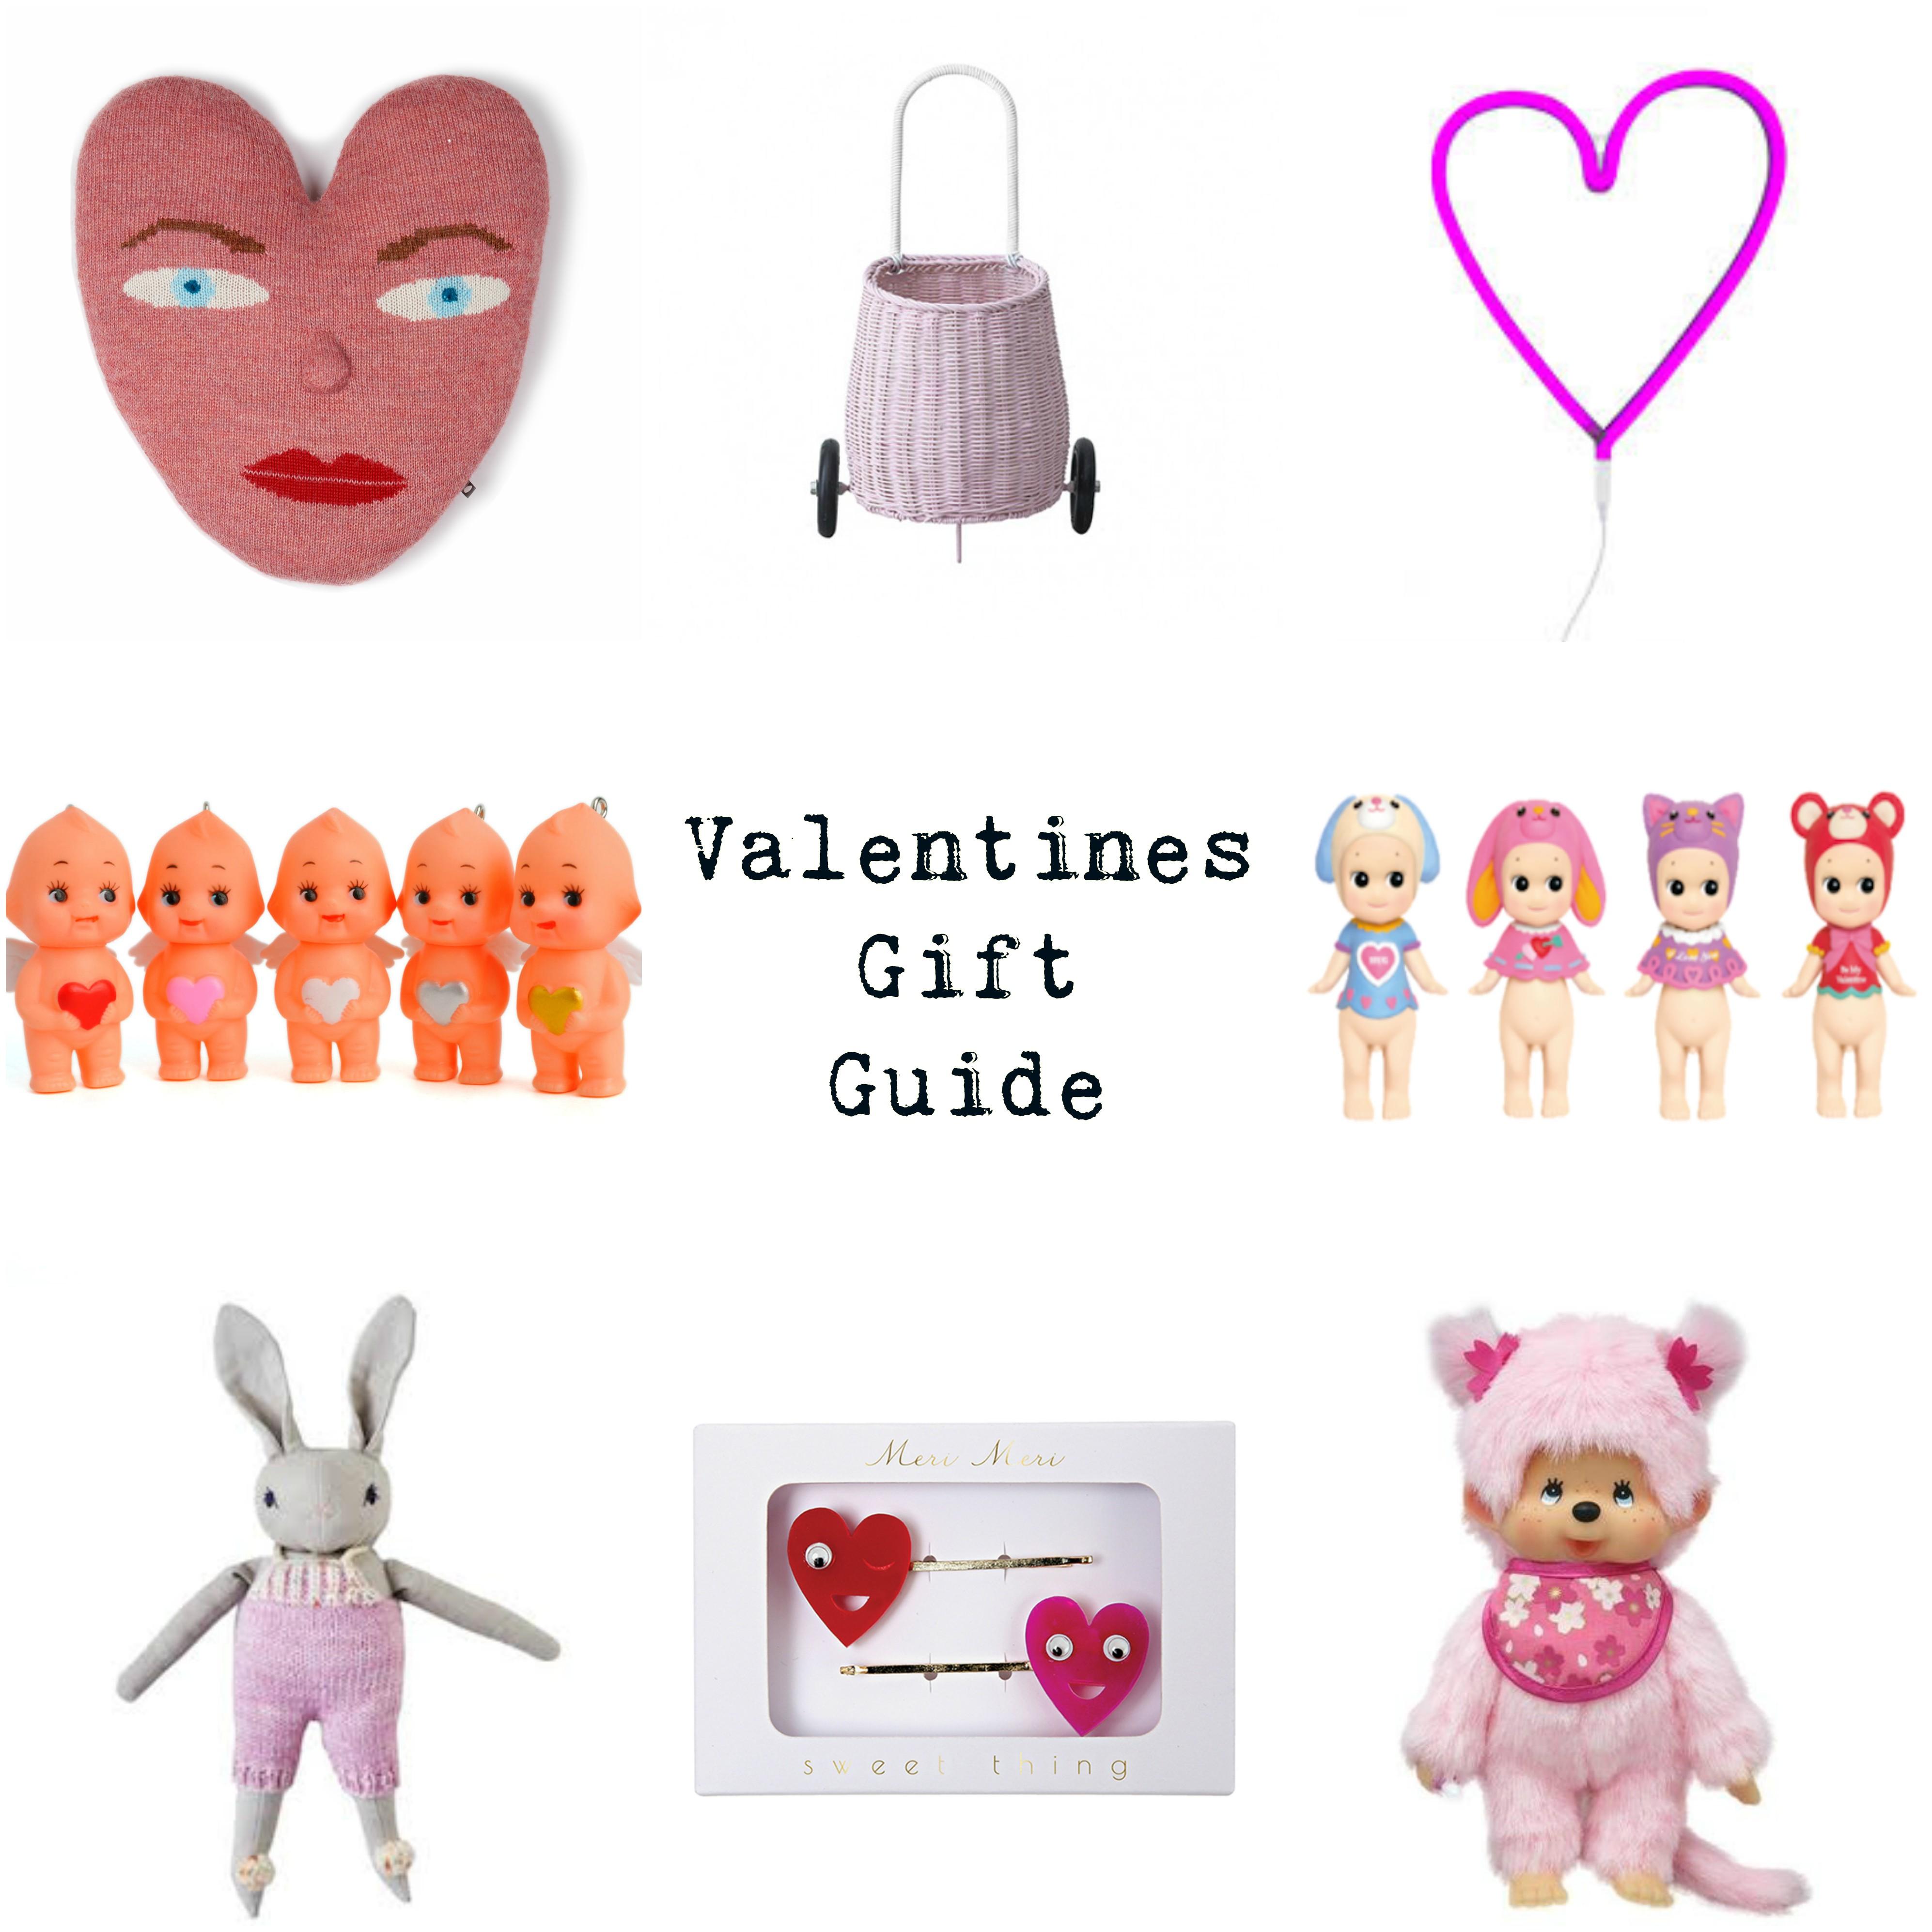 Valentines_day_gift_guide_kids_chloeuberkid